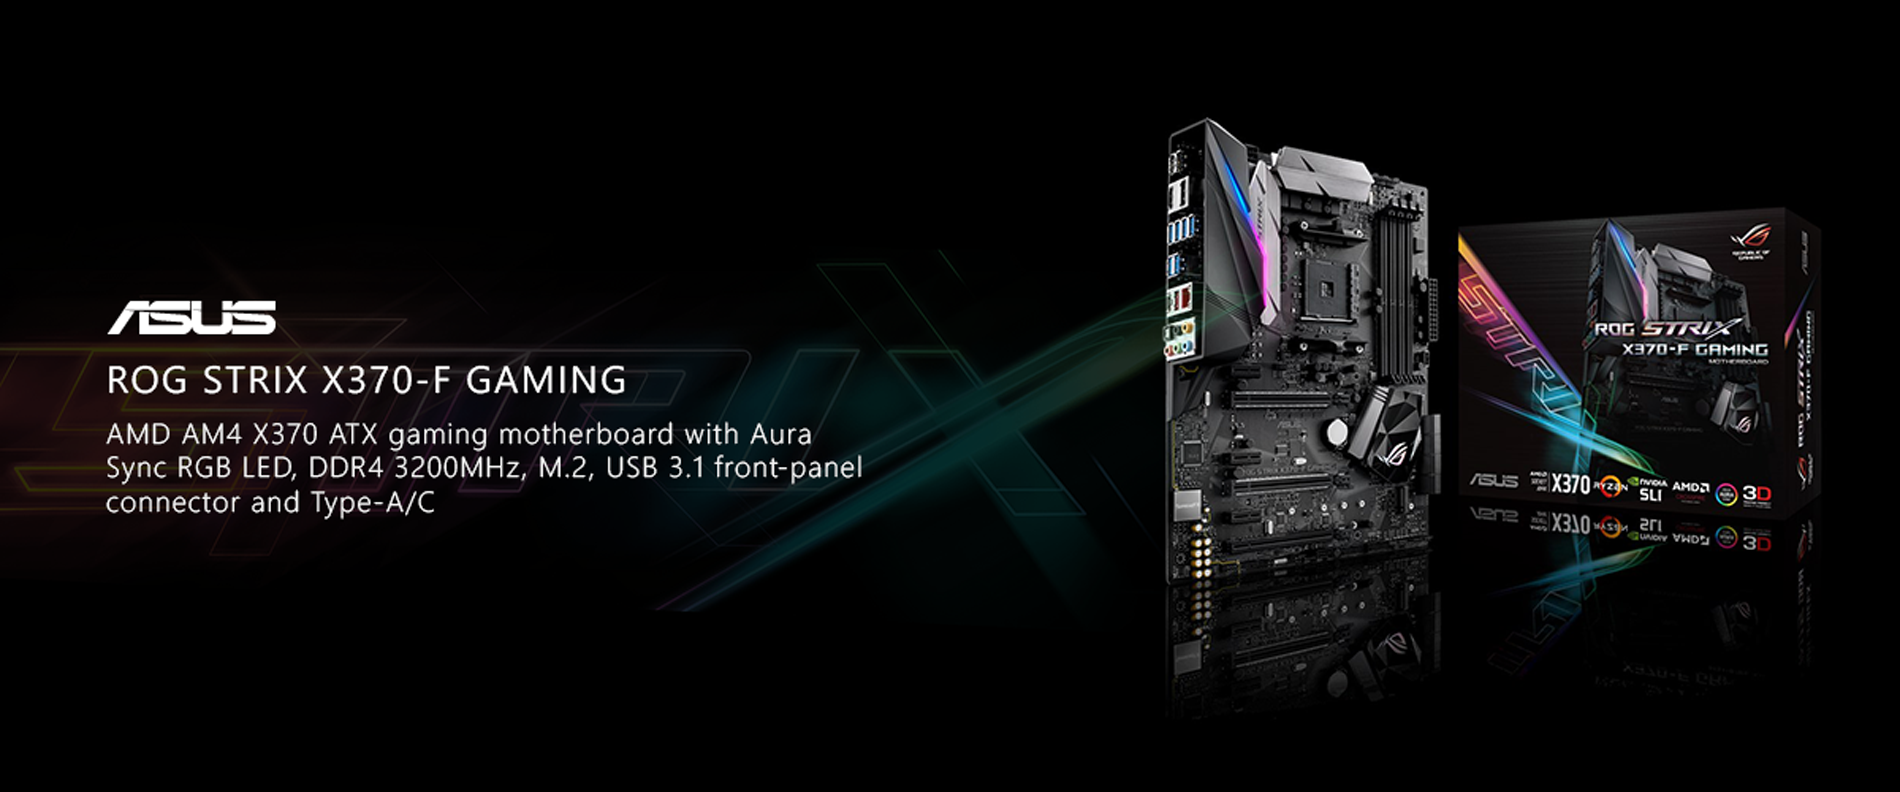 ASUS ROG Strix X370-F Gaming Motherboard